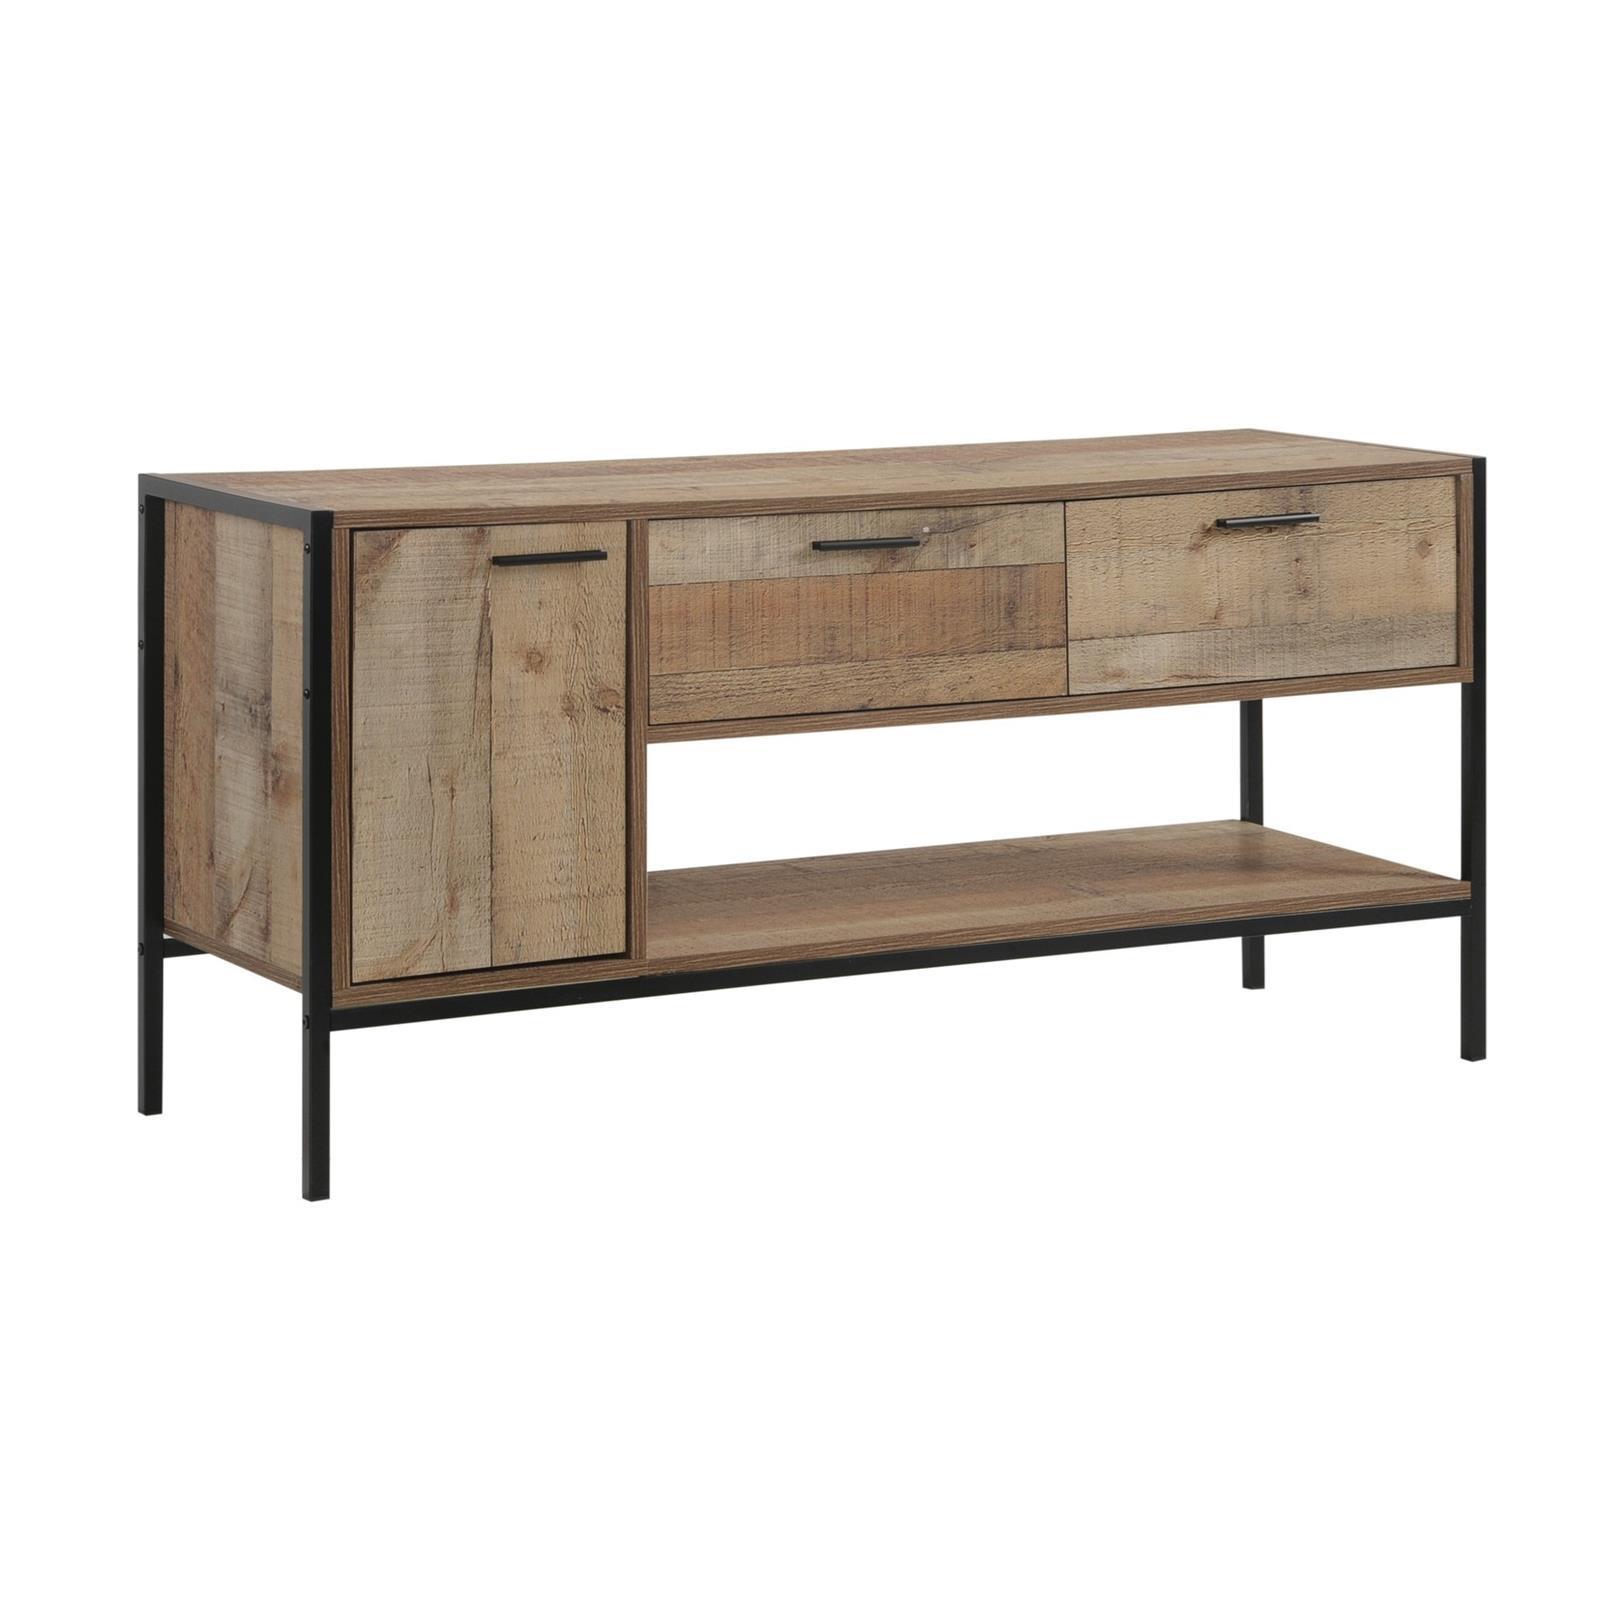 PALLET-W έπιπλο TV με 2συρτάρια, ντουλάπι, ράφι antique oak Y60x124x40εκ.